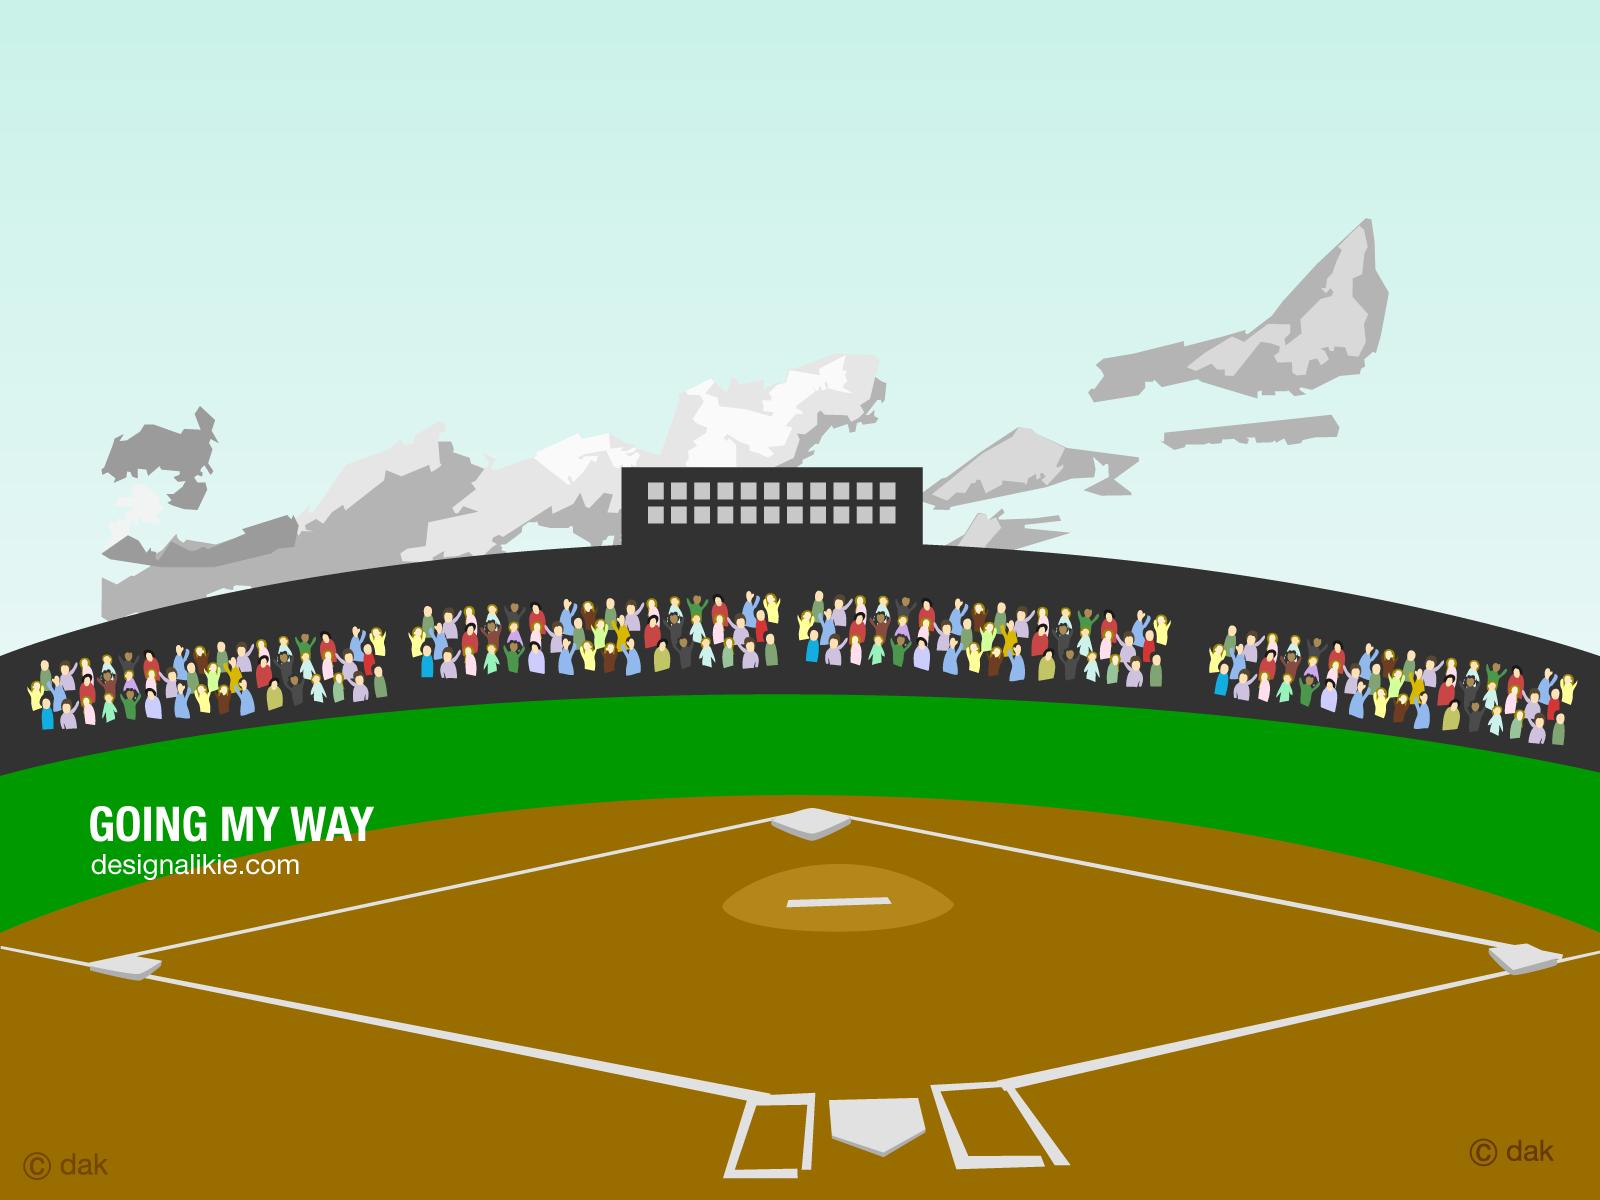 Baseball Stadium Clipart .-Baseball Stadium Clipart .-5